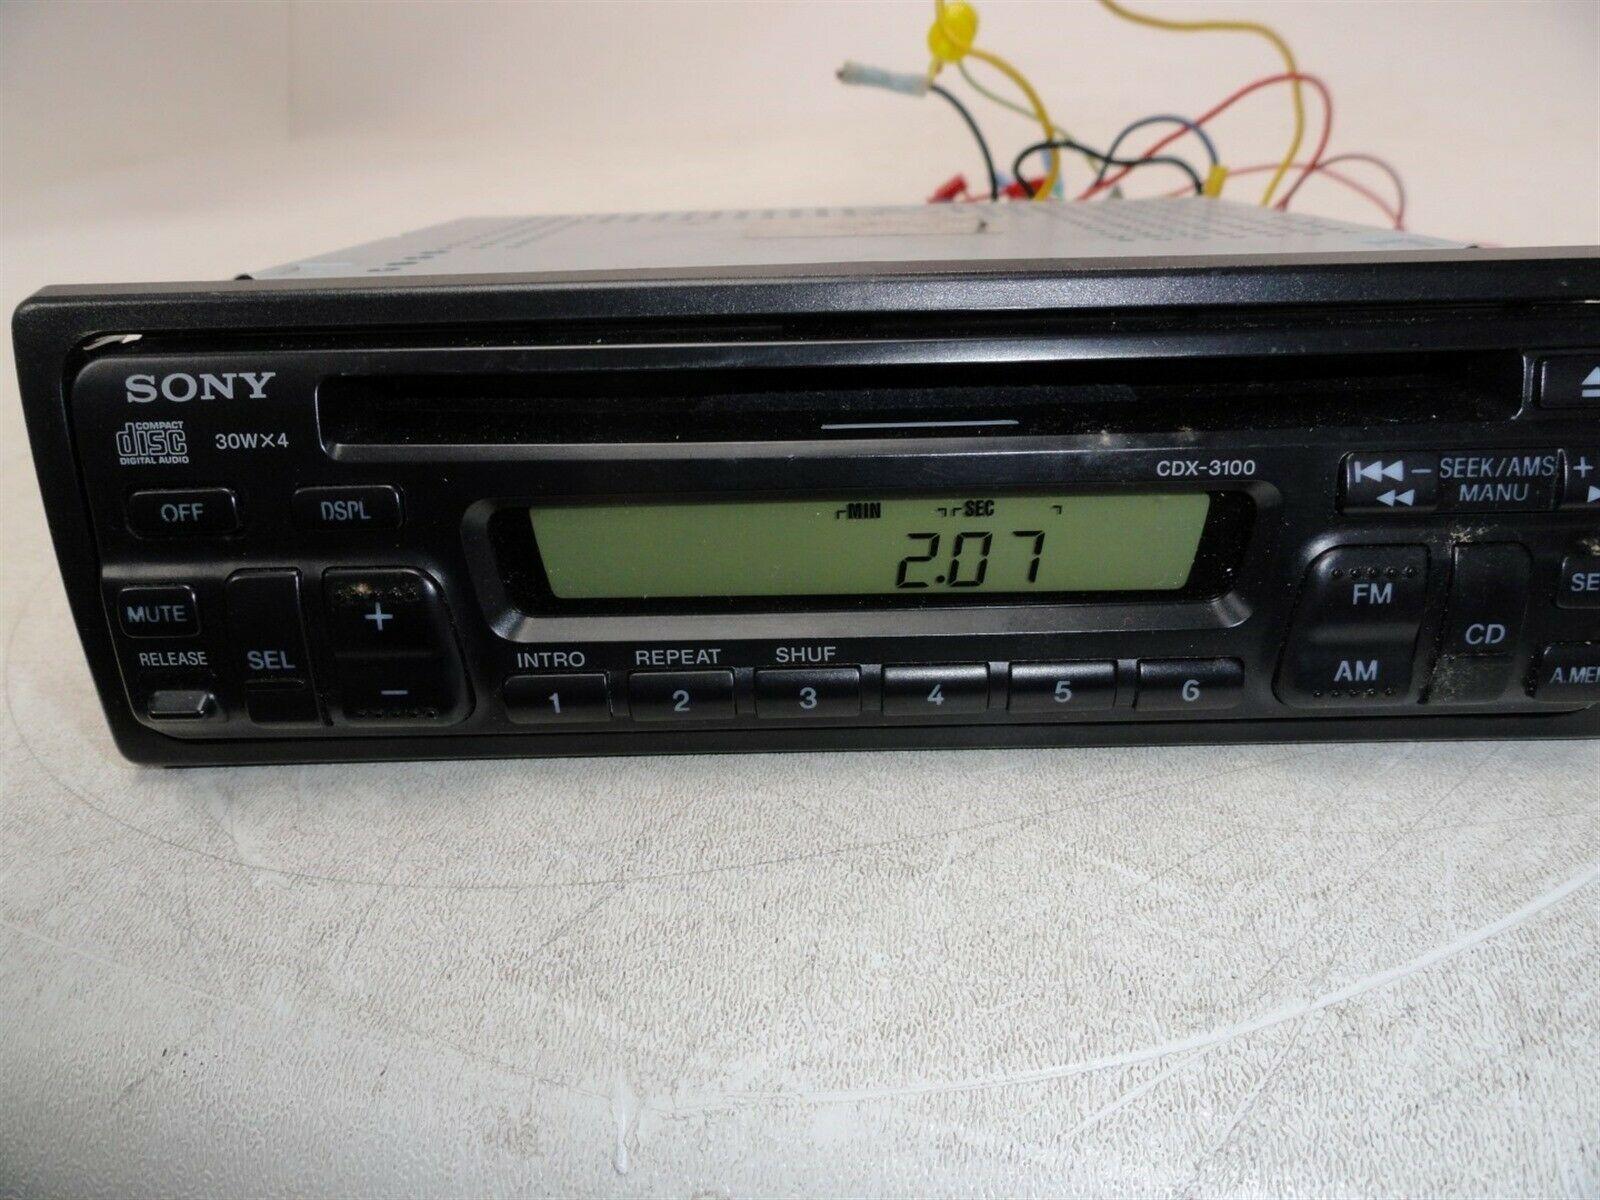 sony car stereo wiring harness cdx gt620    sony       cdx    3100 fm am cd player 30wx4    car       stereo    w    wiring        sony       cdx    3100 fm am cd player 30wx4    car       stereo    w    wiring